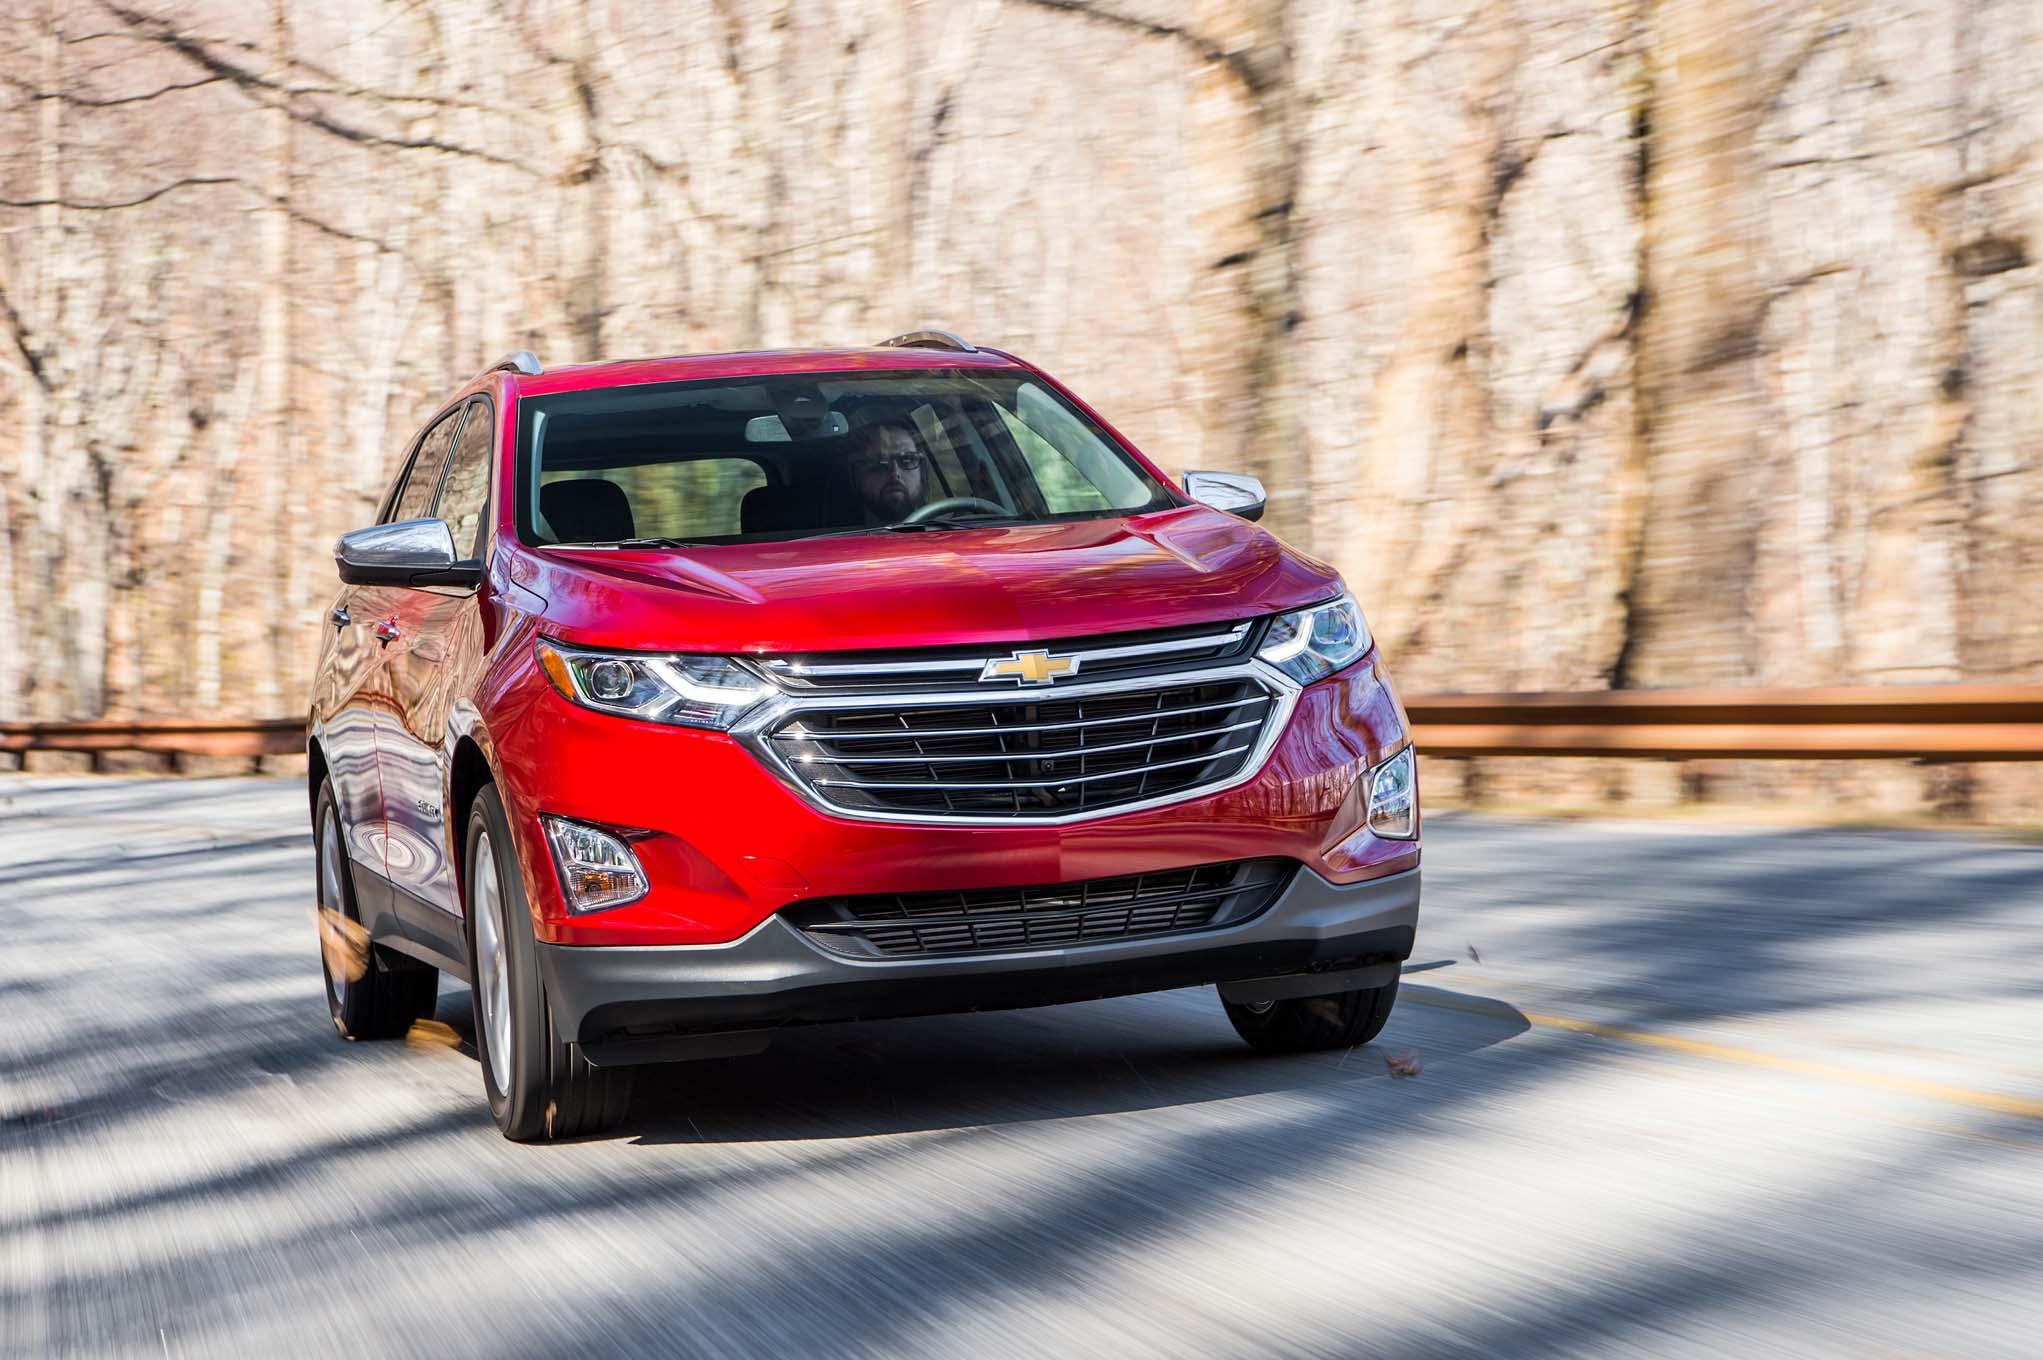 2018 Chevrolet Equinox Front Three Quarter In Motion 22